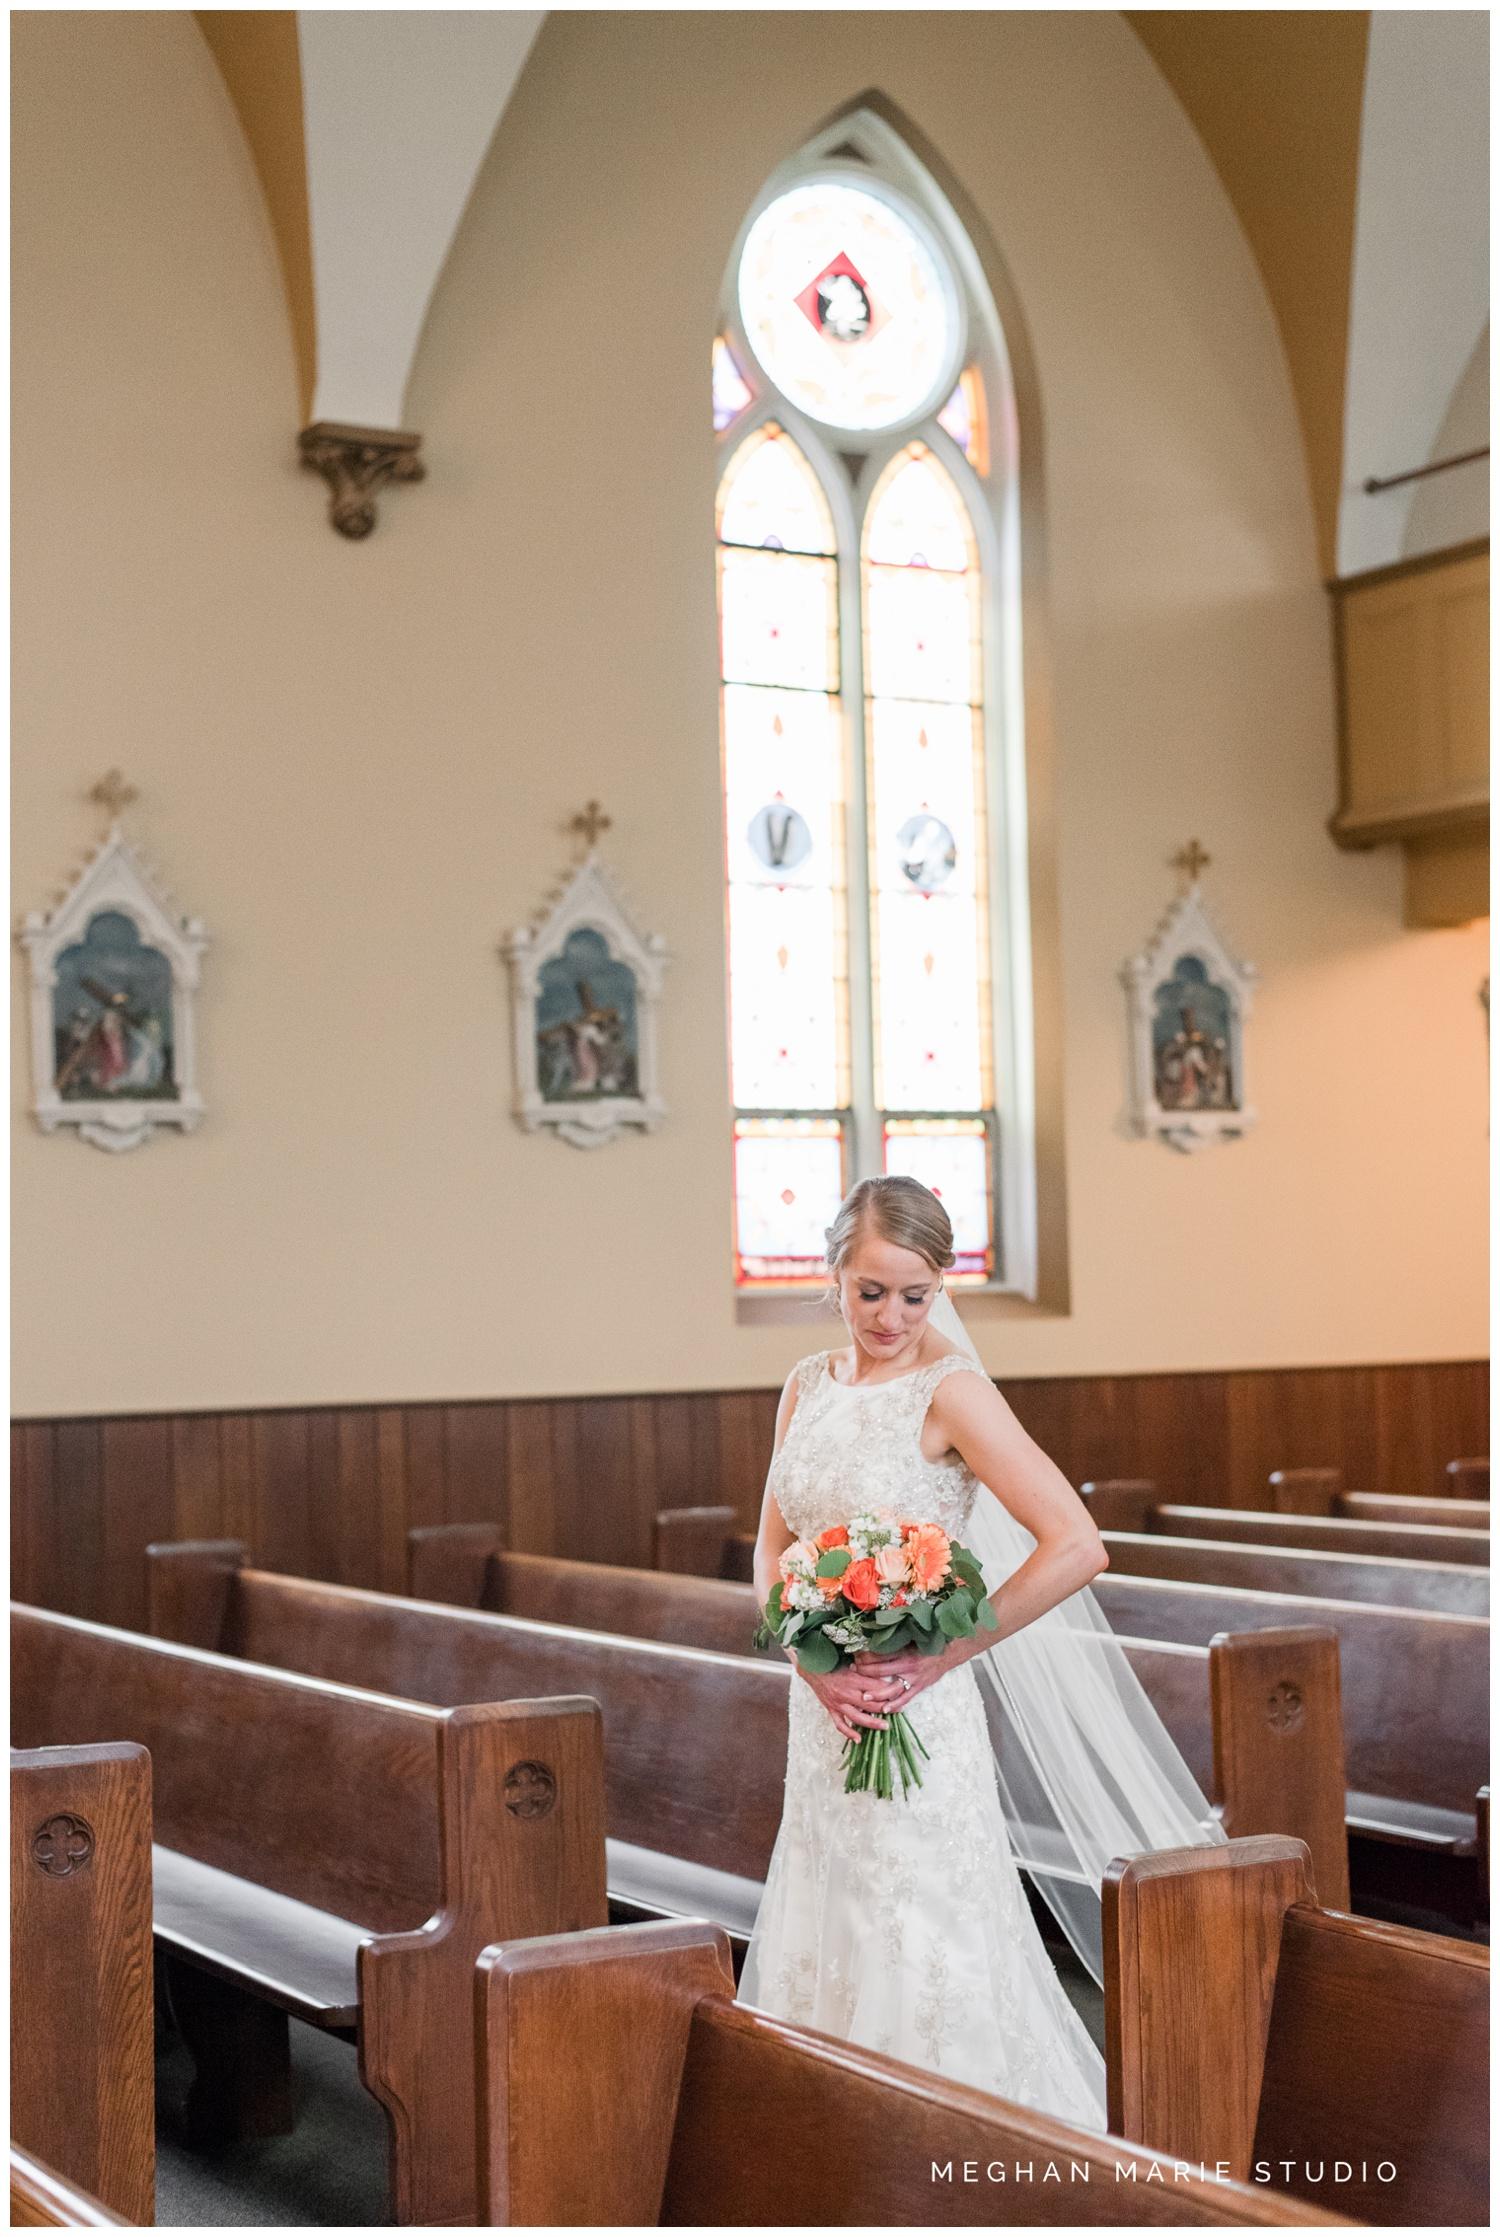 meghan marie studio country catholic ohio wedding_0225.jpg